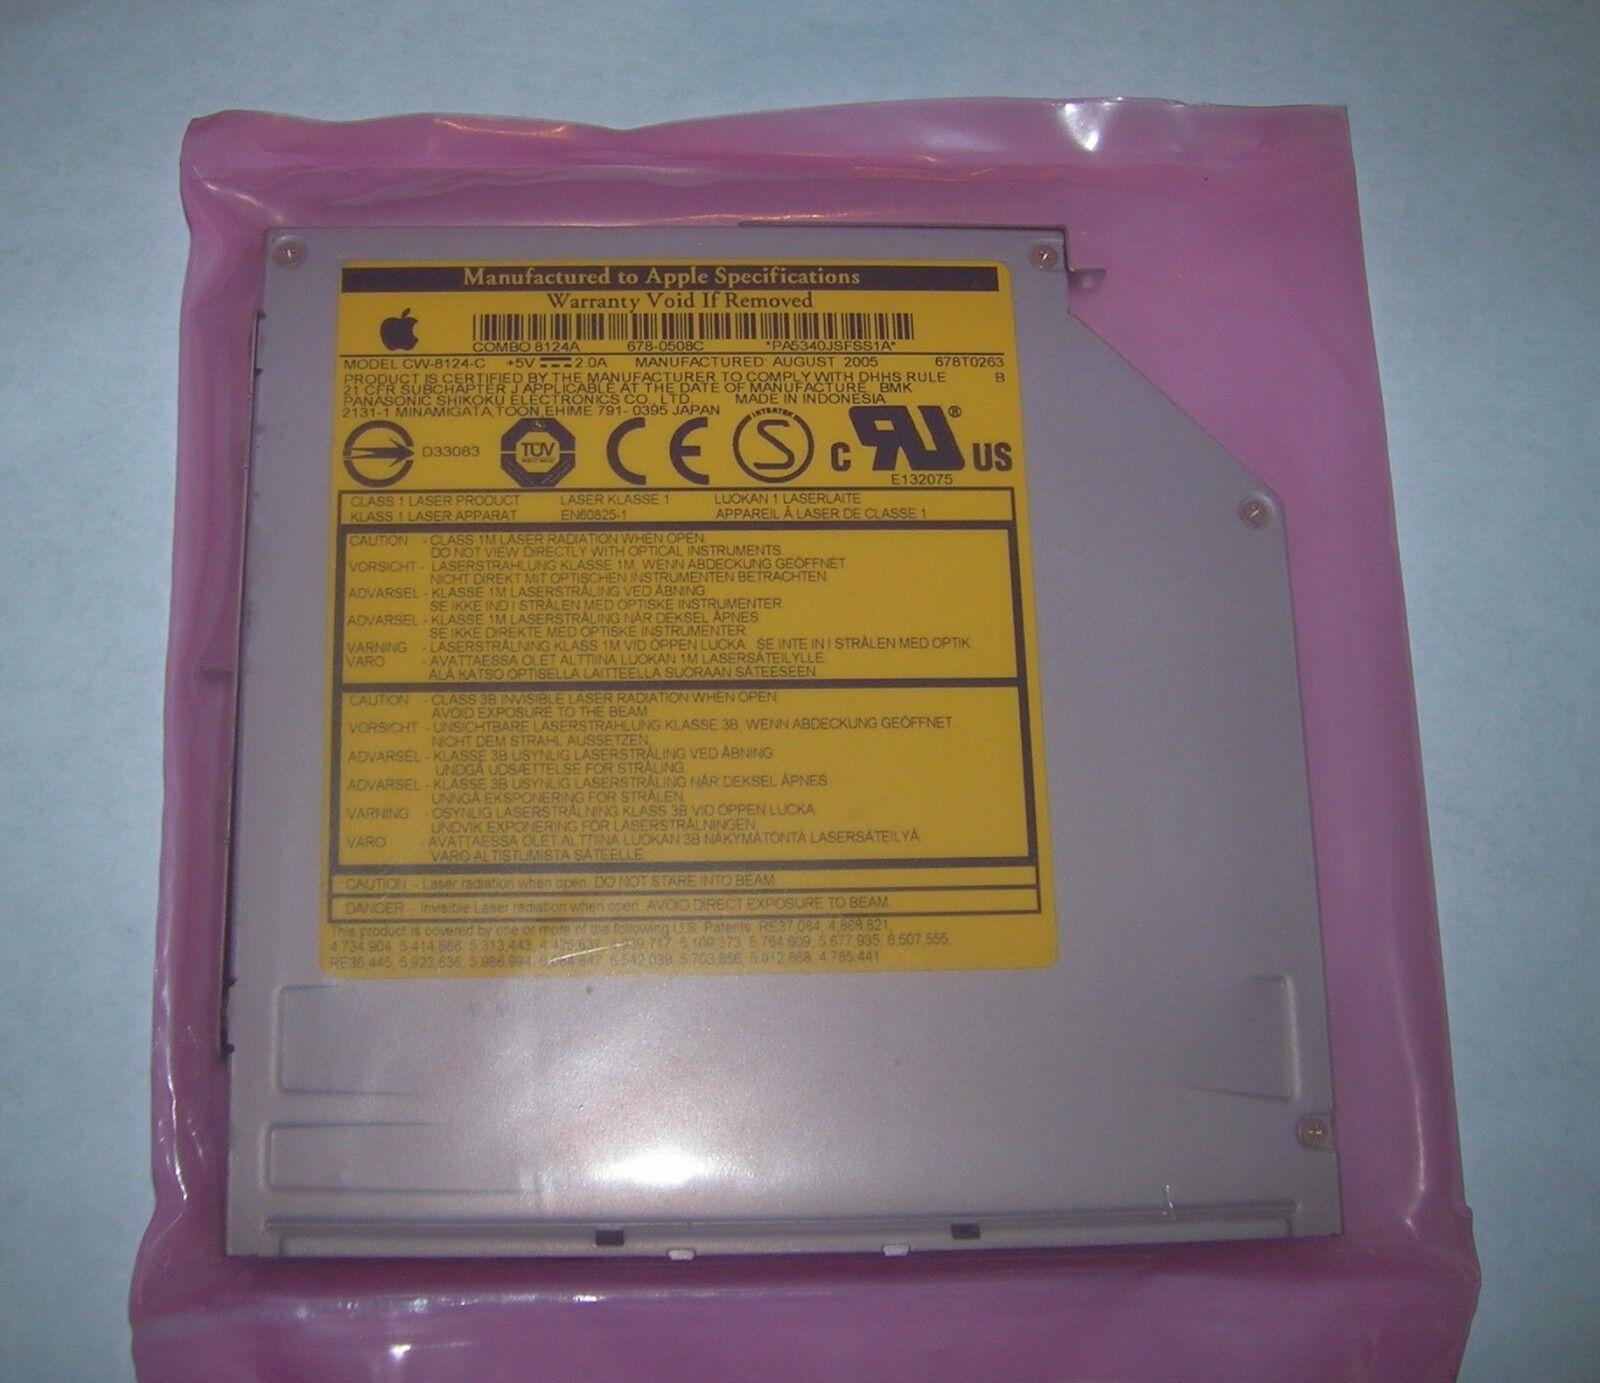 Sony Panasonic Cw-8124-c Apple Mac Dvd Burner Combo Drive...